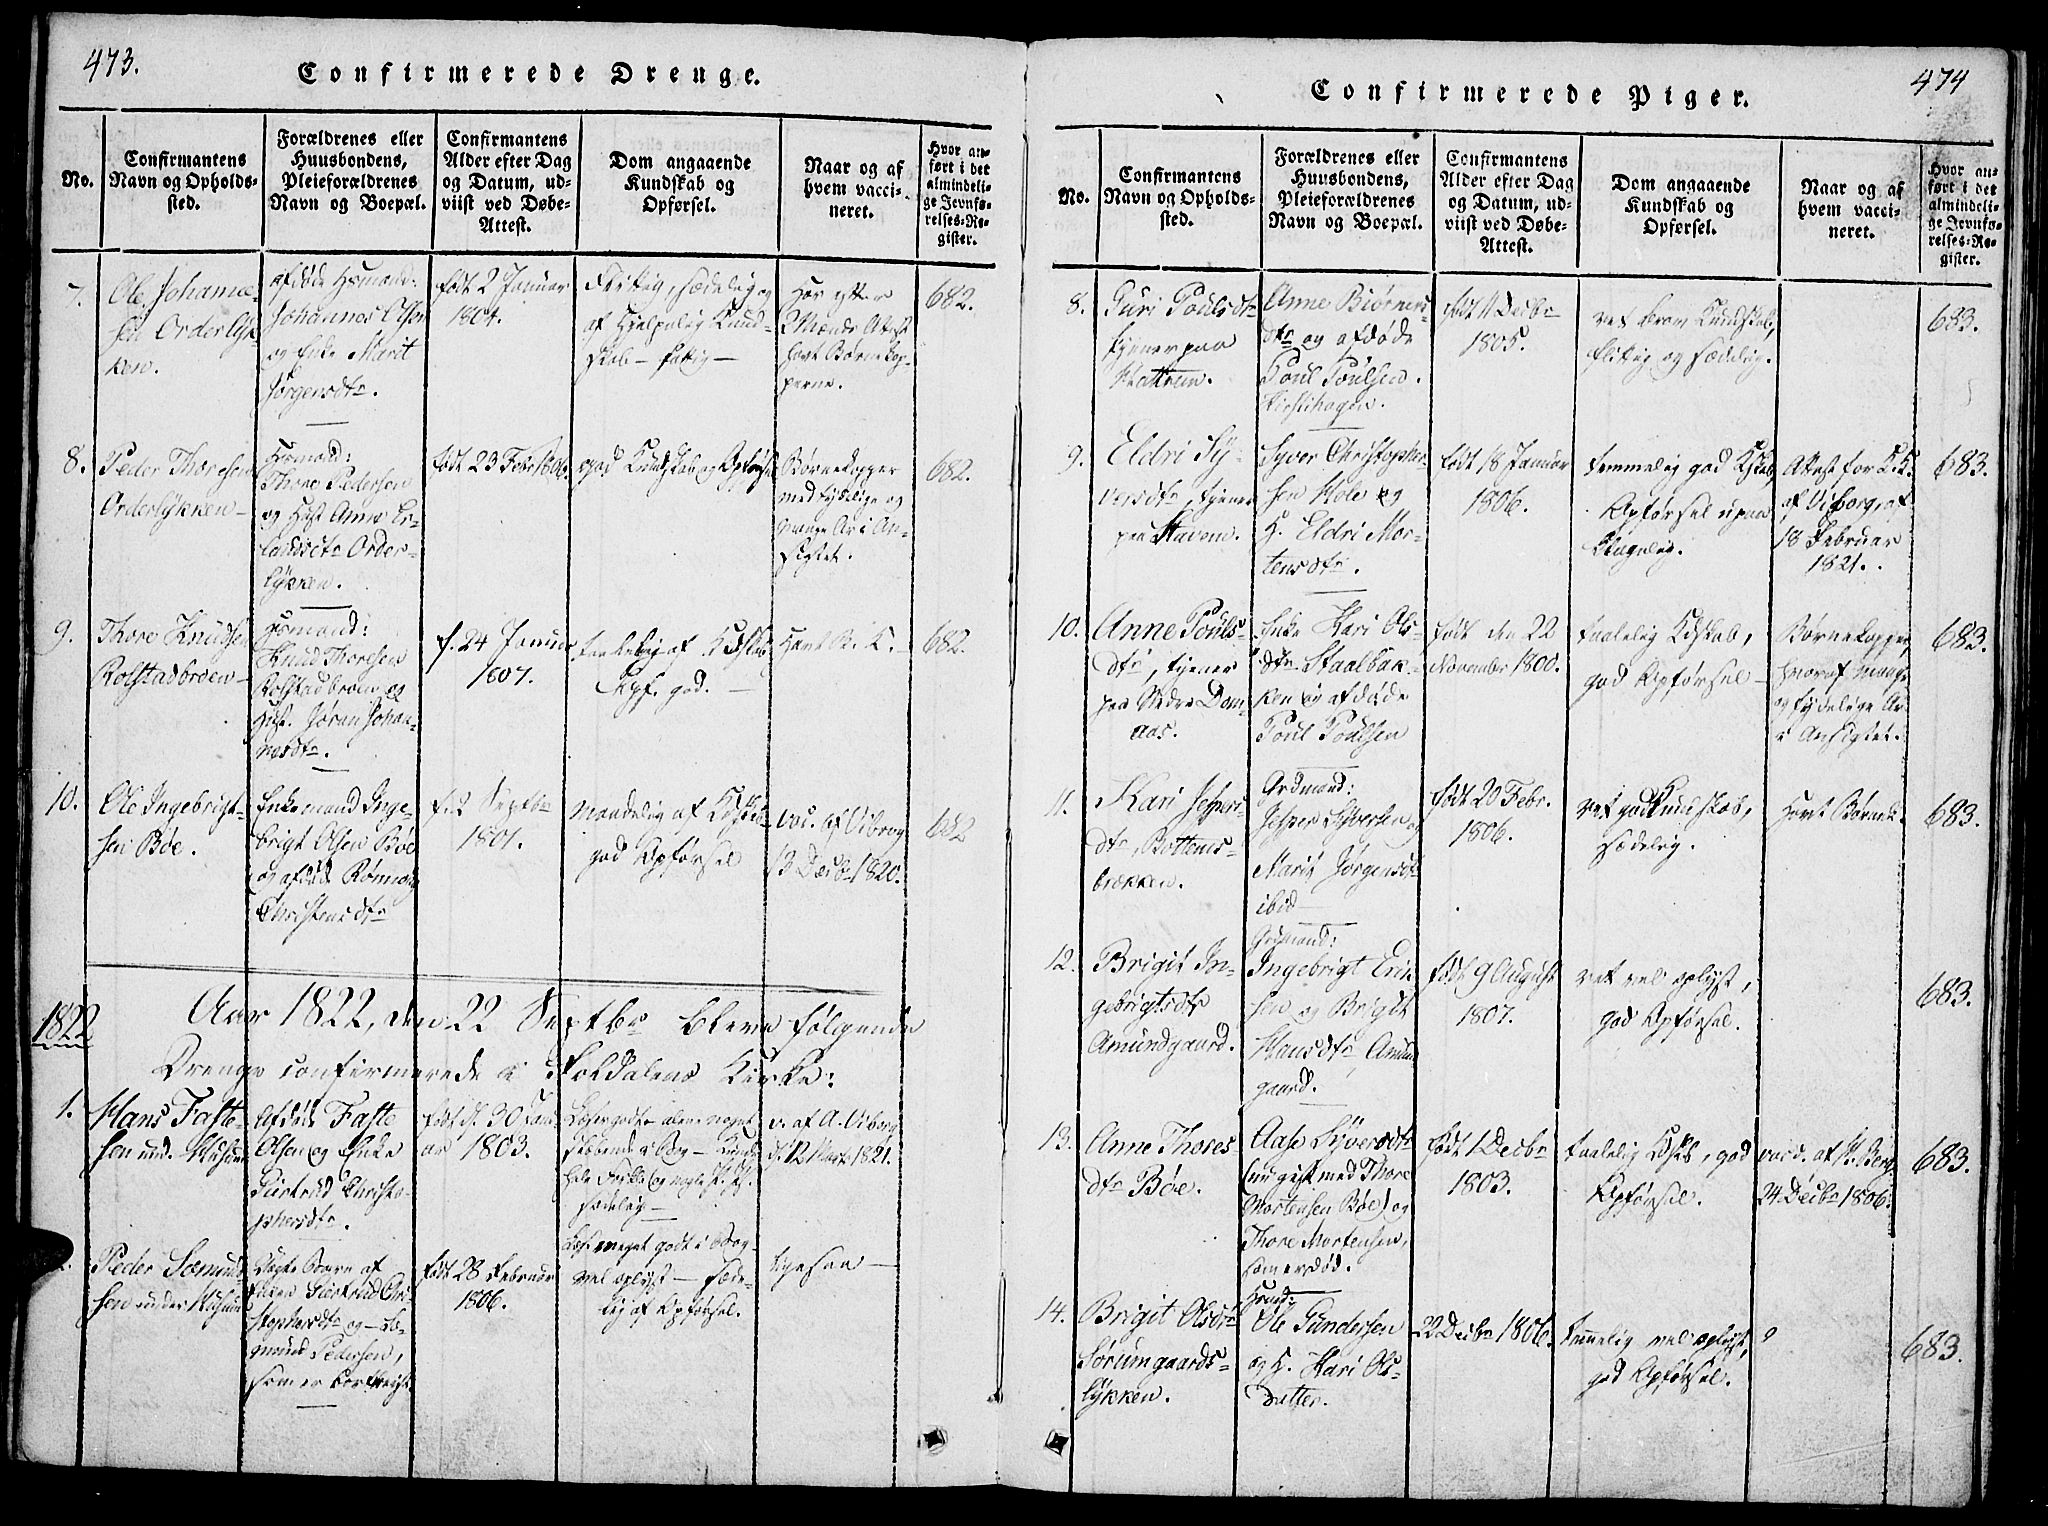 SAH, Lesja prestekontor, Ministerialbok nr. 4, 1820-1829, s. 473-474